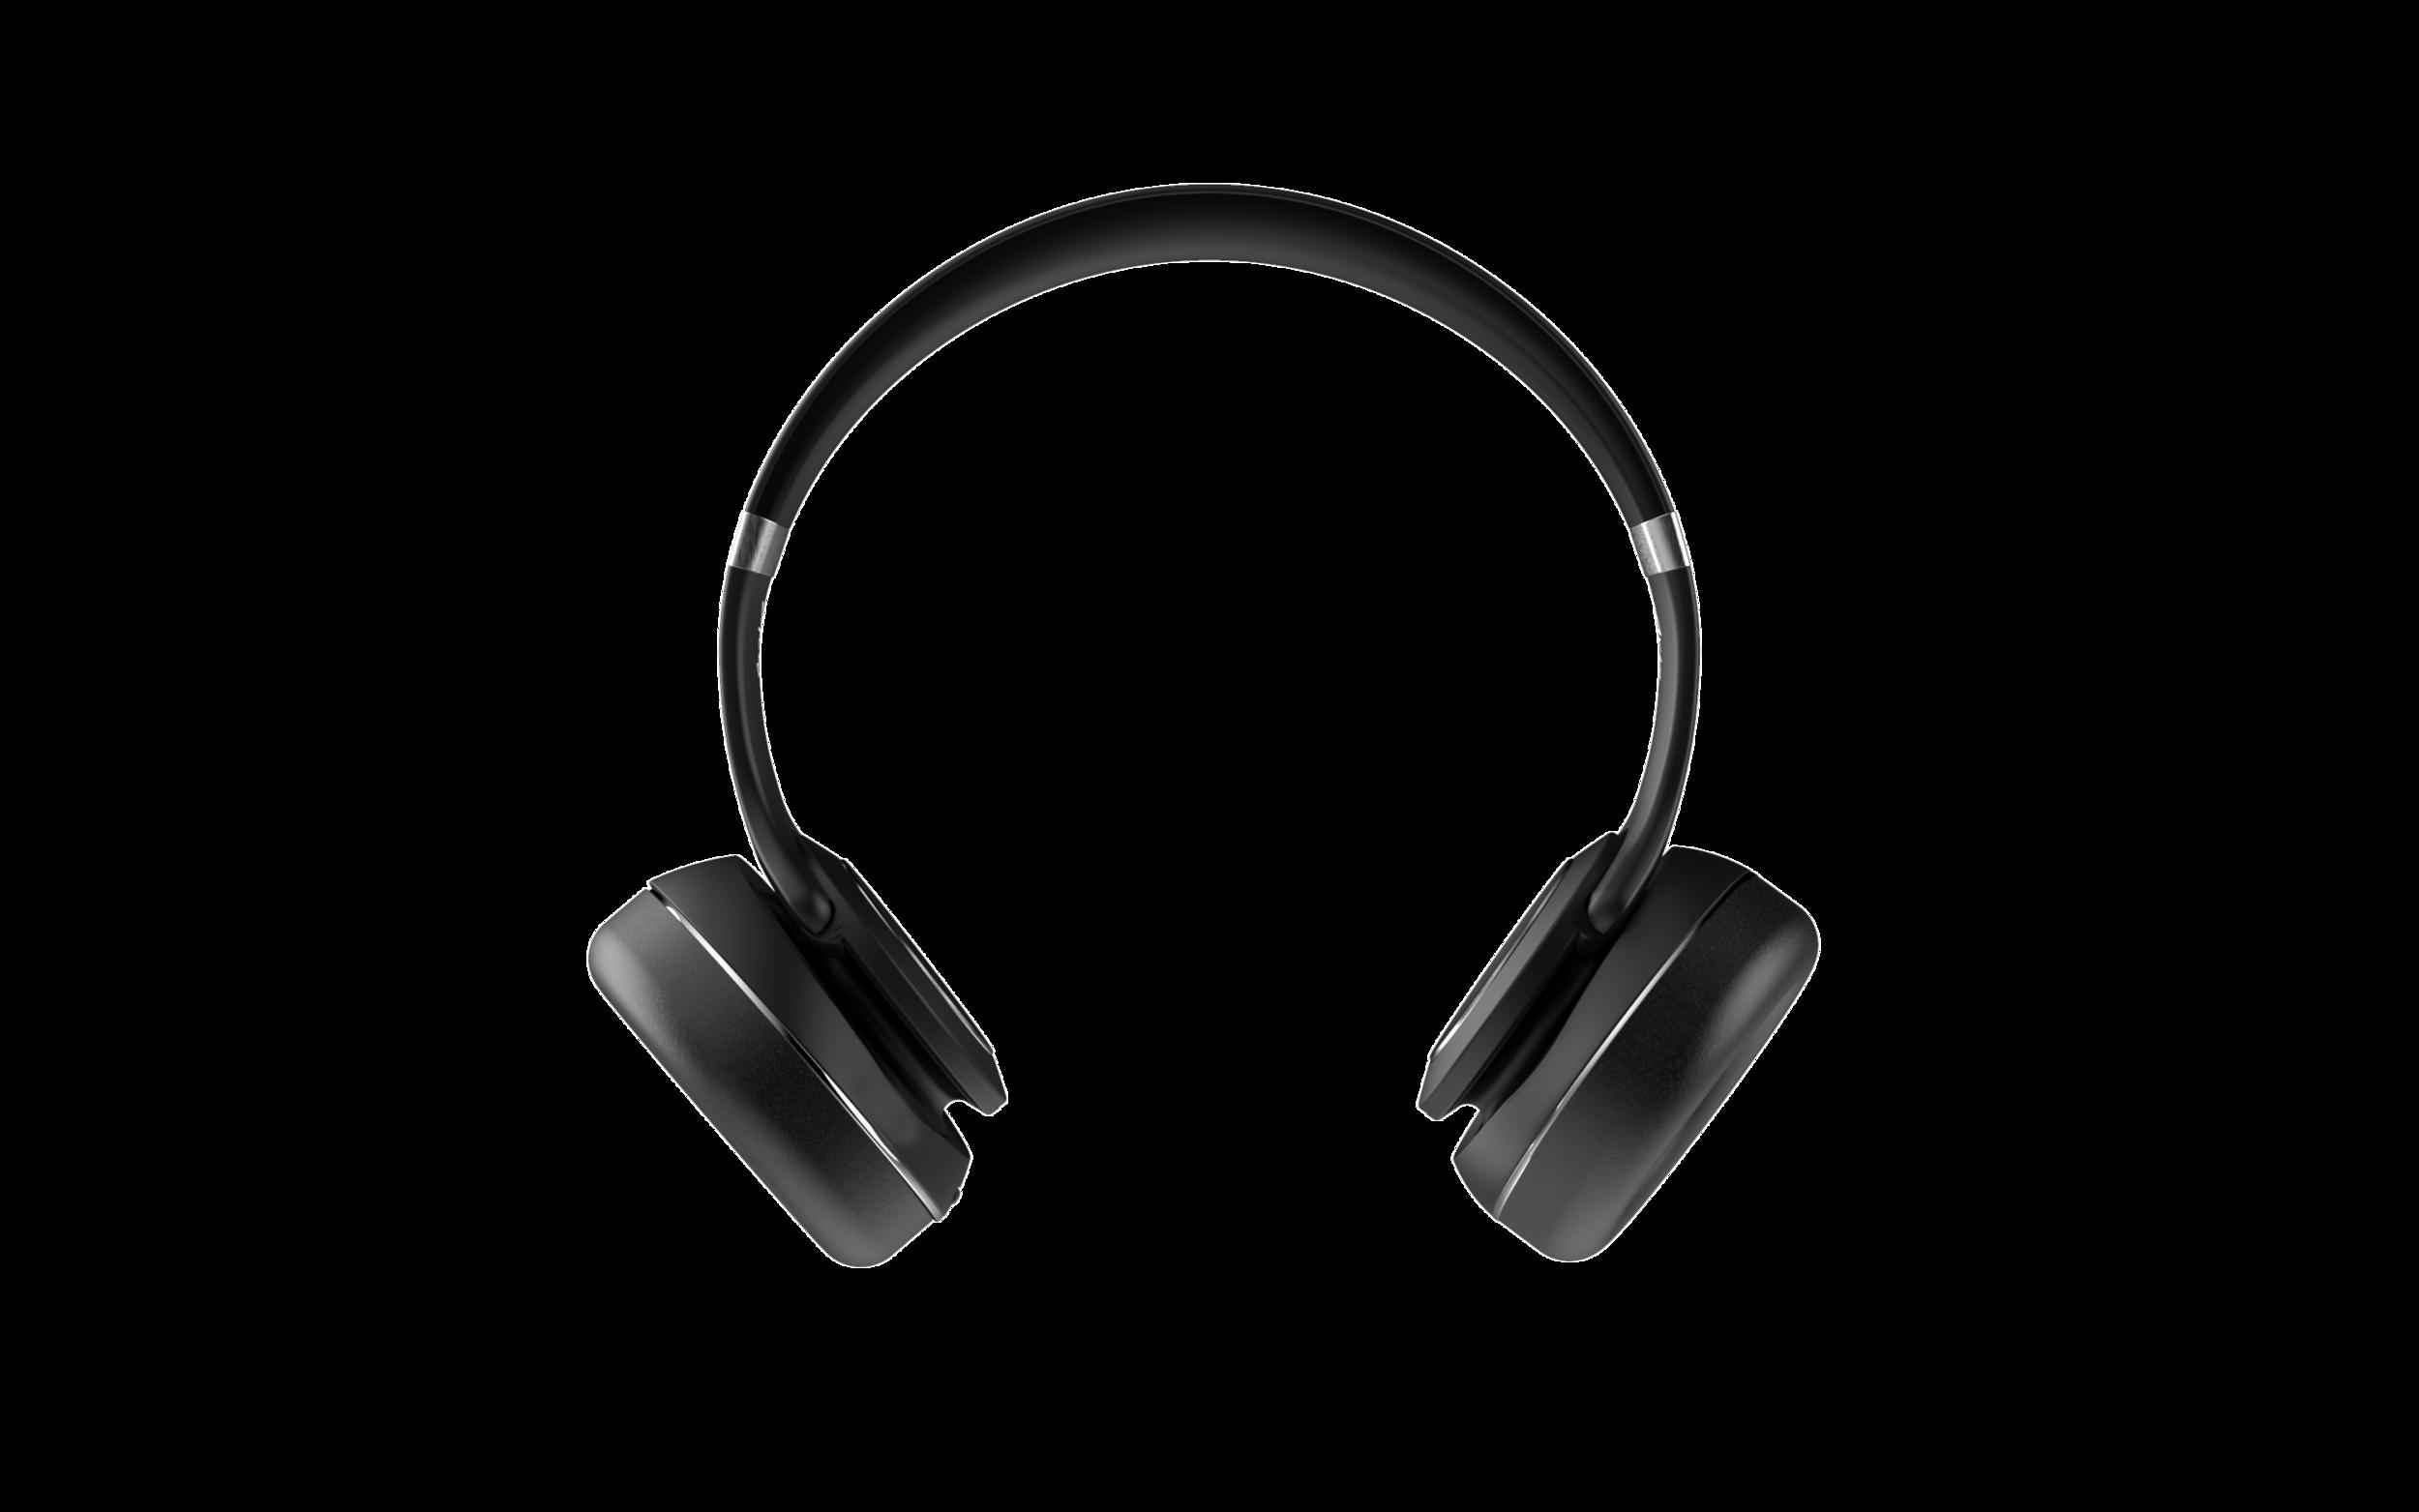 buoq-headphones-white11.png